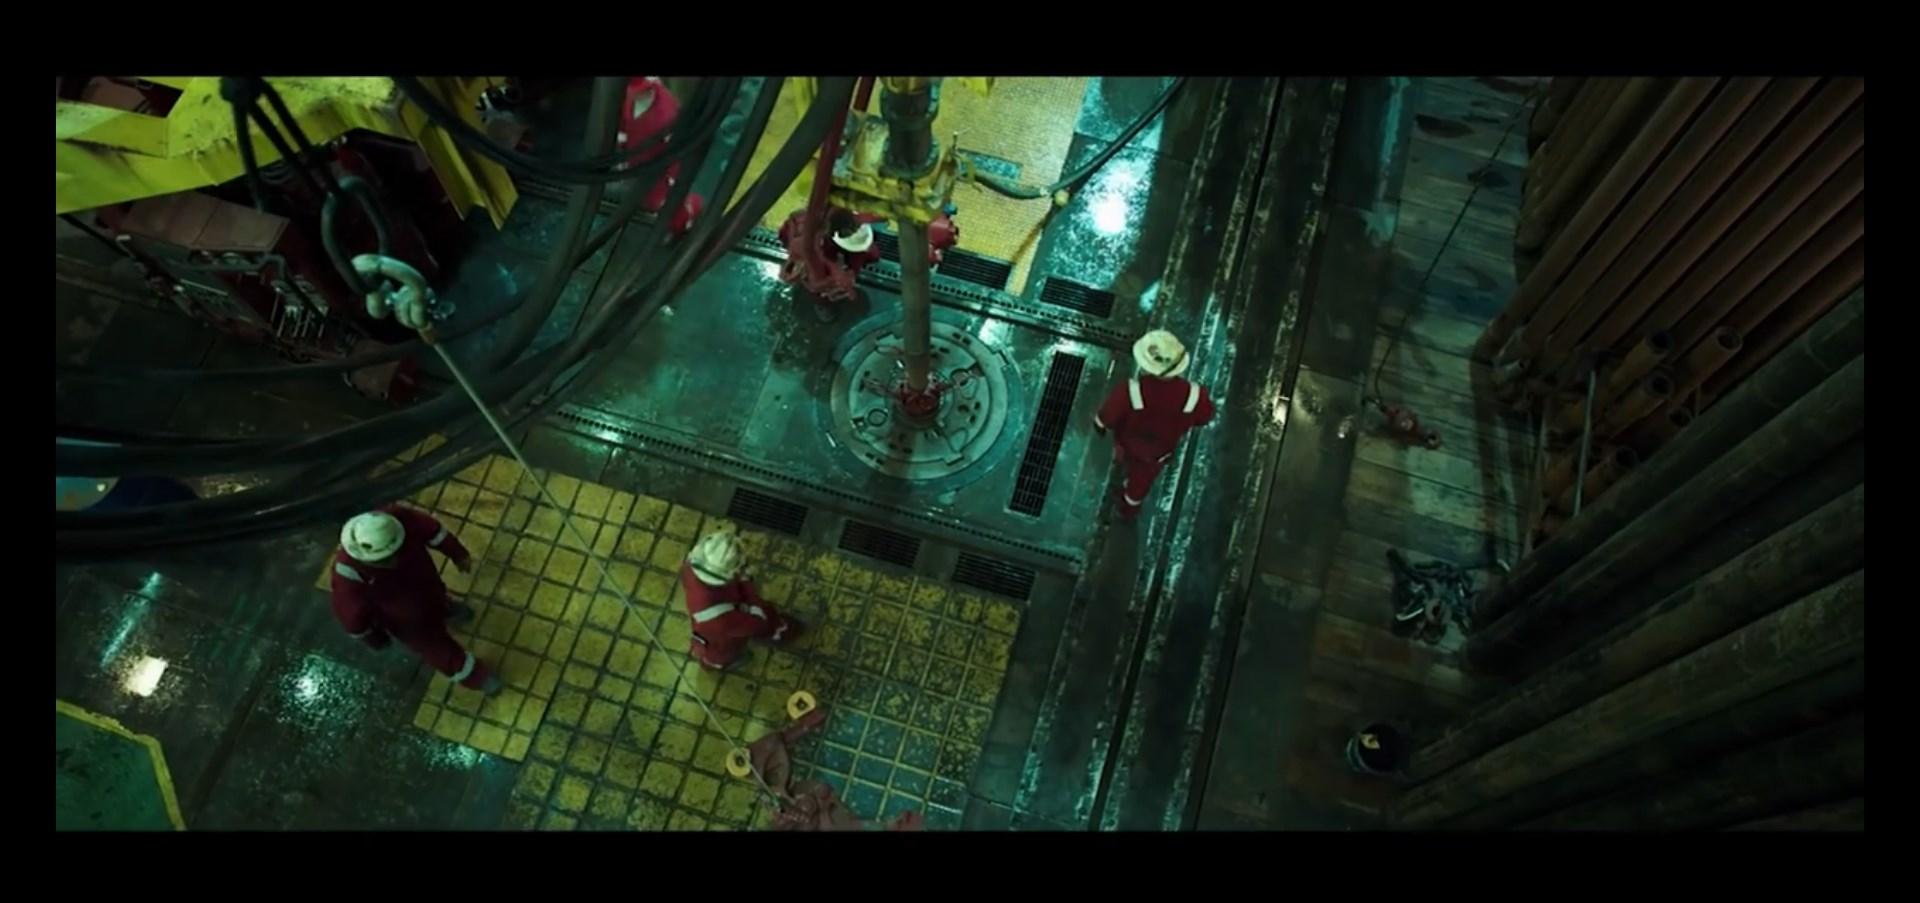 Bild aus dem Film: Deepwater Horizon